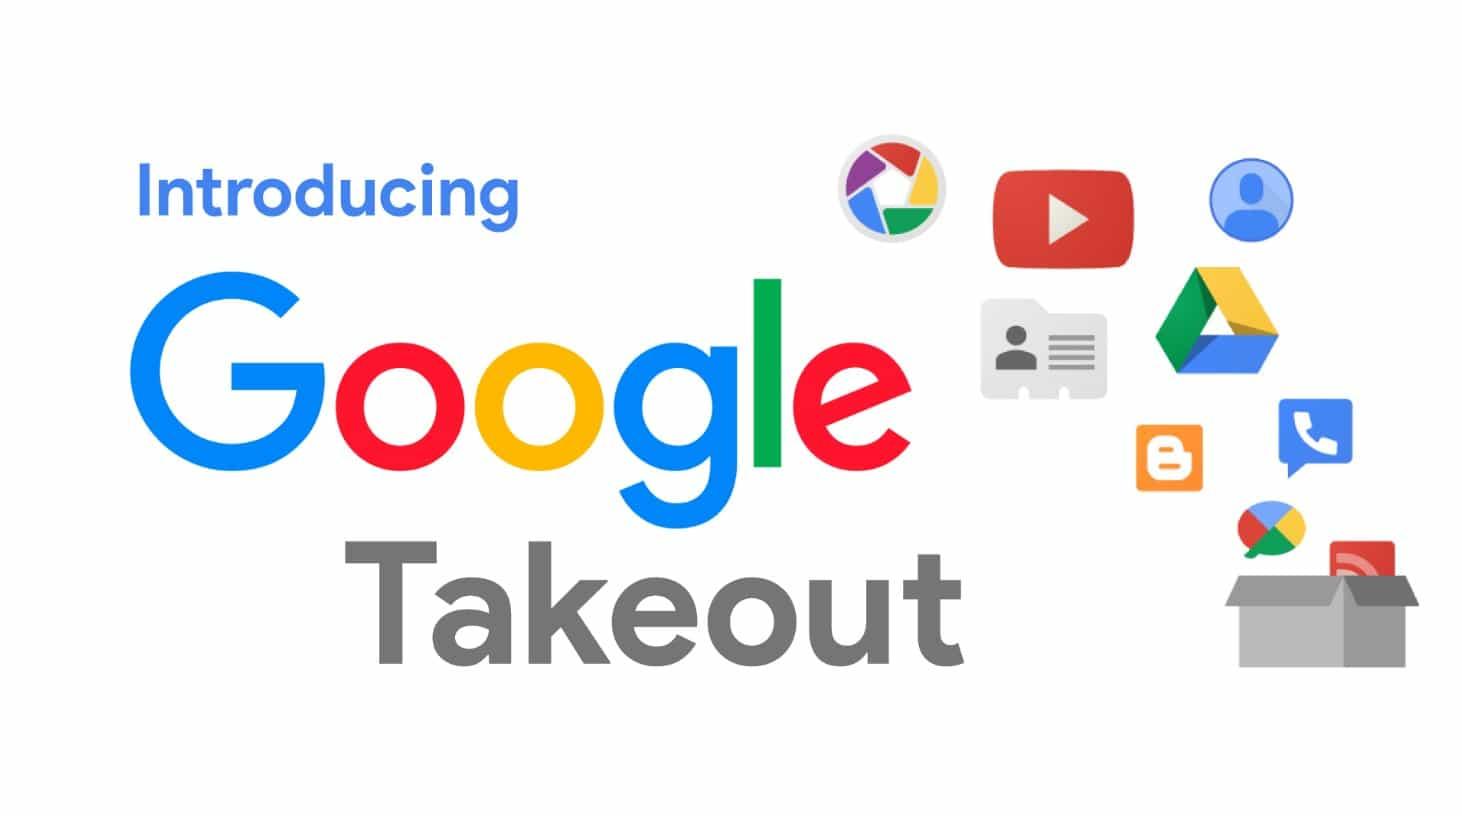 Google+ Google Takeout